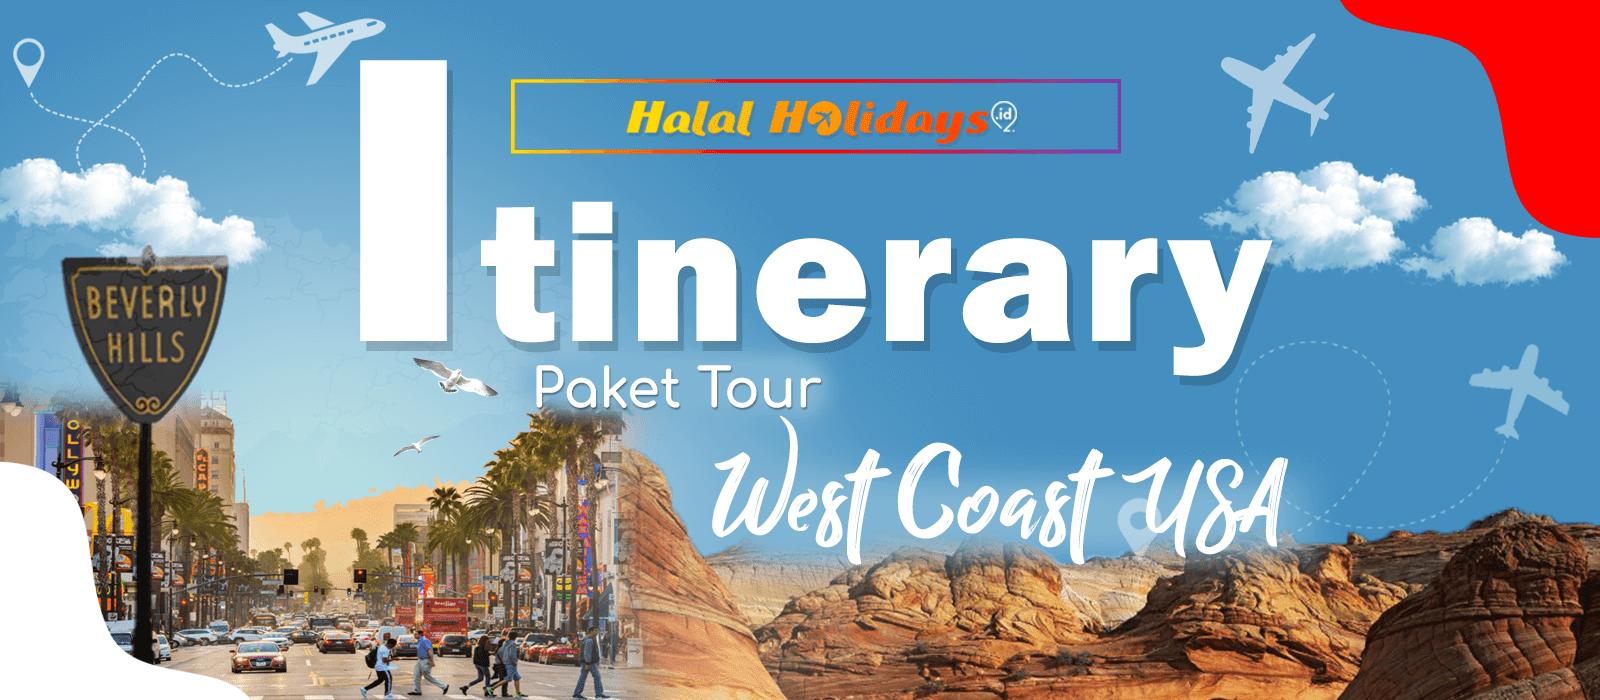 Itinerary Paket Tour Halal Amerika West Coast USA 9 Hari